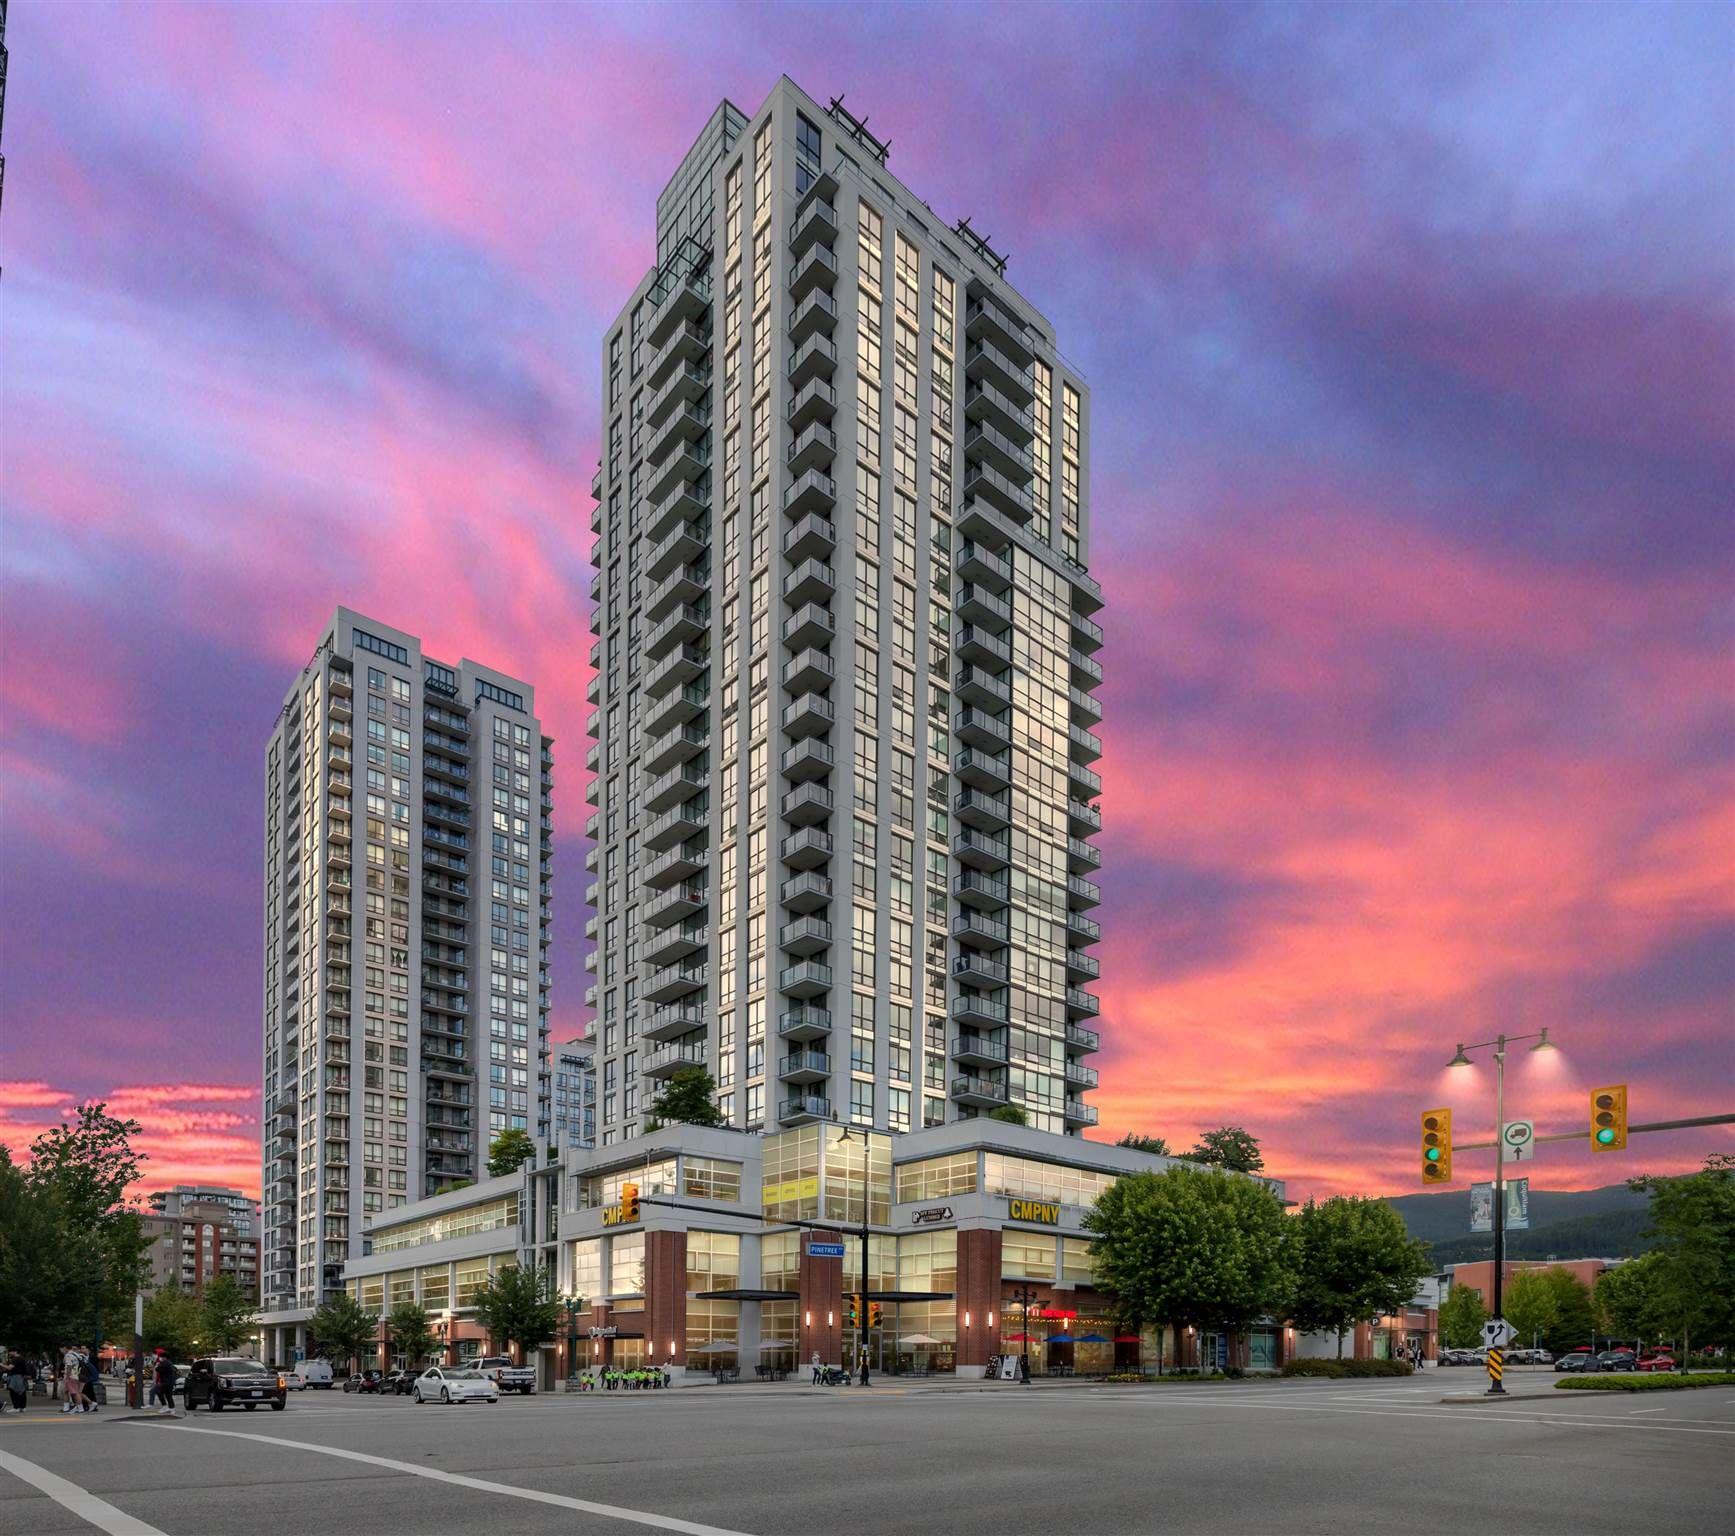 Main Photo: 1508 3007 GLEN Drive in Coquitlam: North Coquitlam Condo for sale : MLS®# R2605212